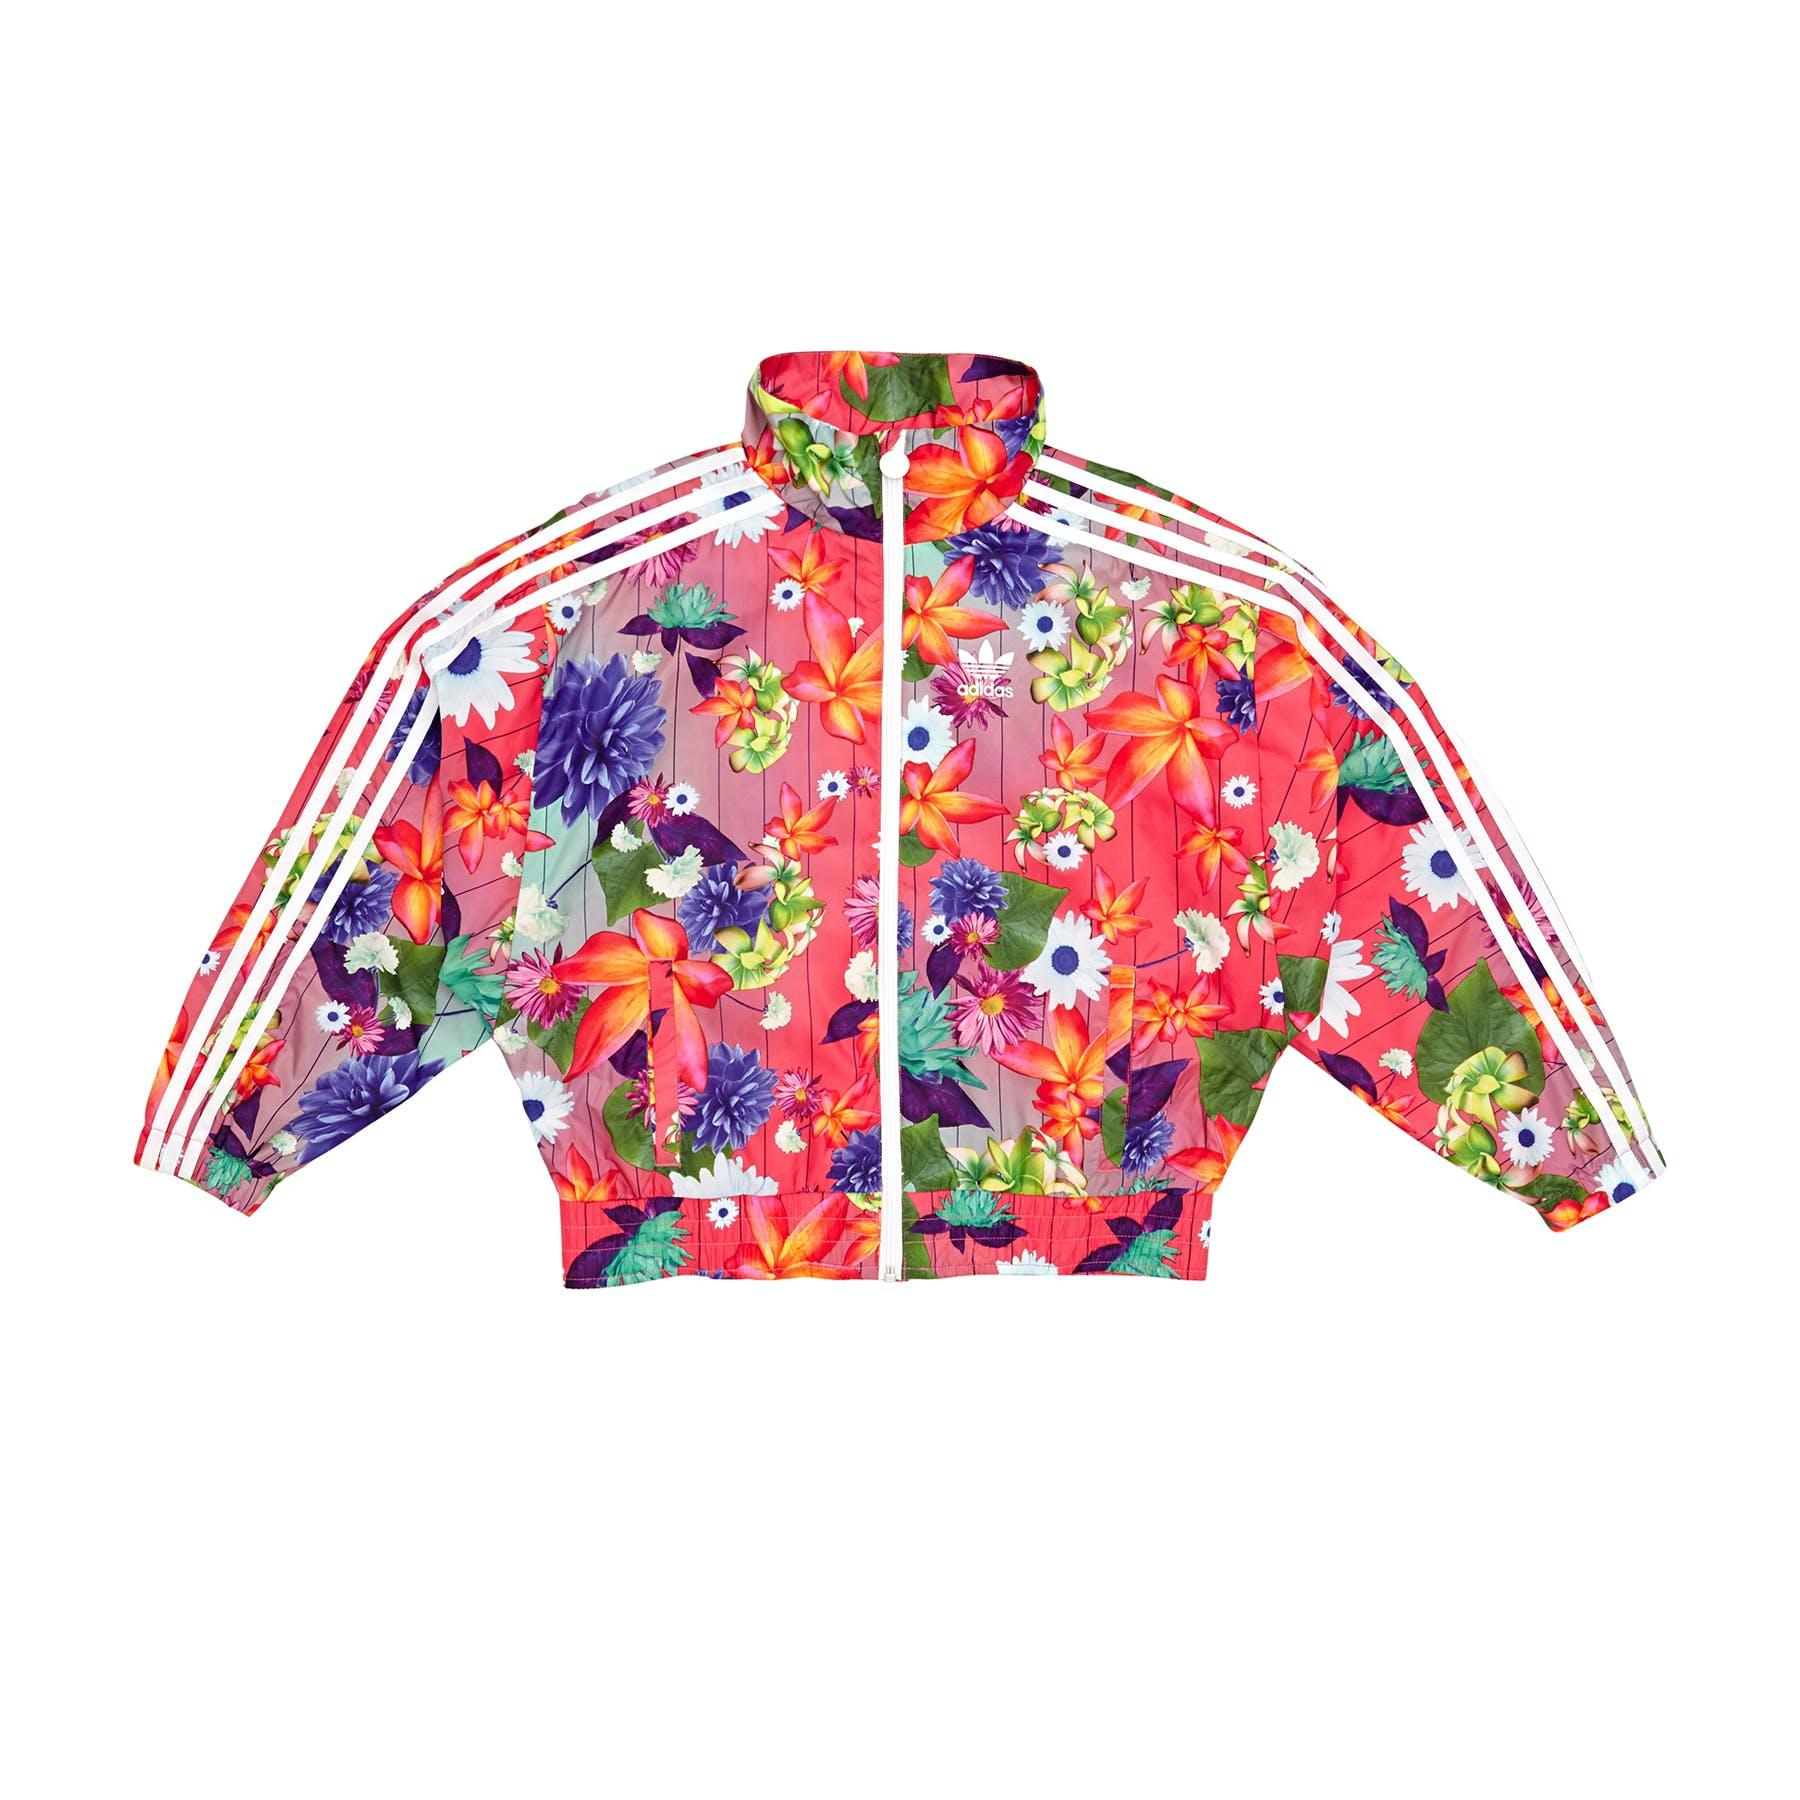 Adidas Originals Graphic Girls Windproof Jacket